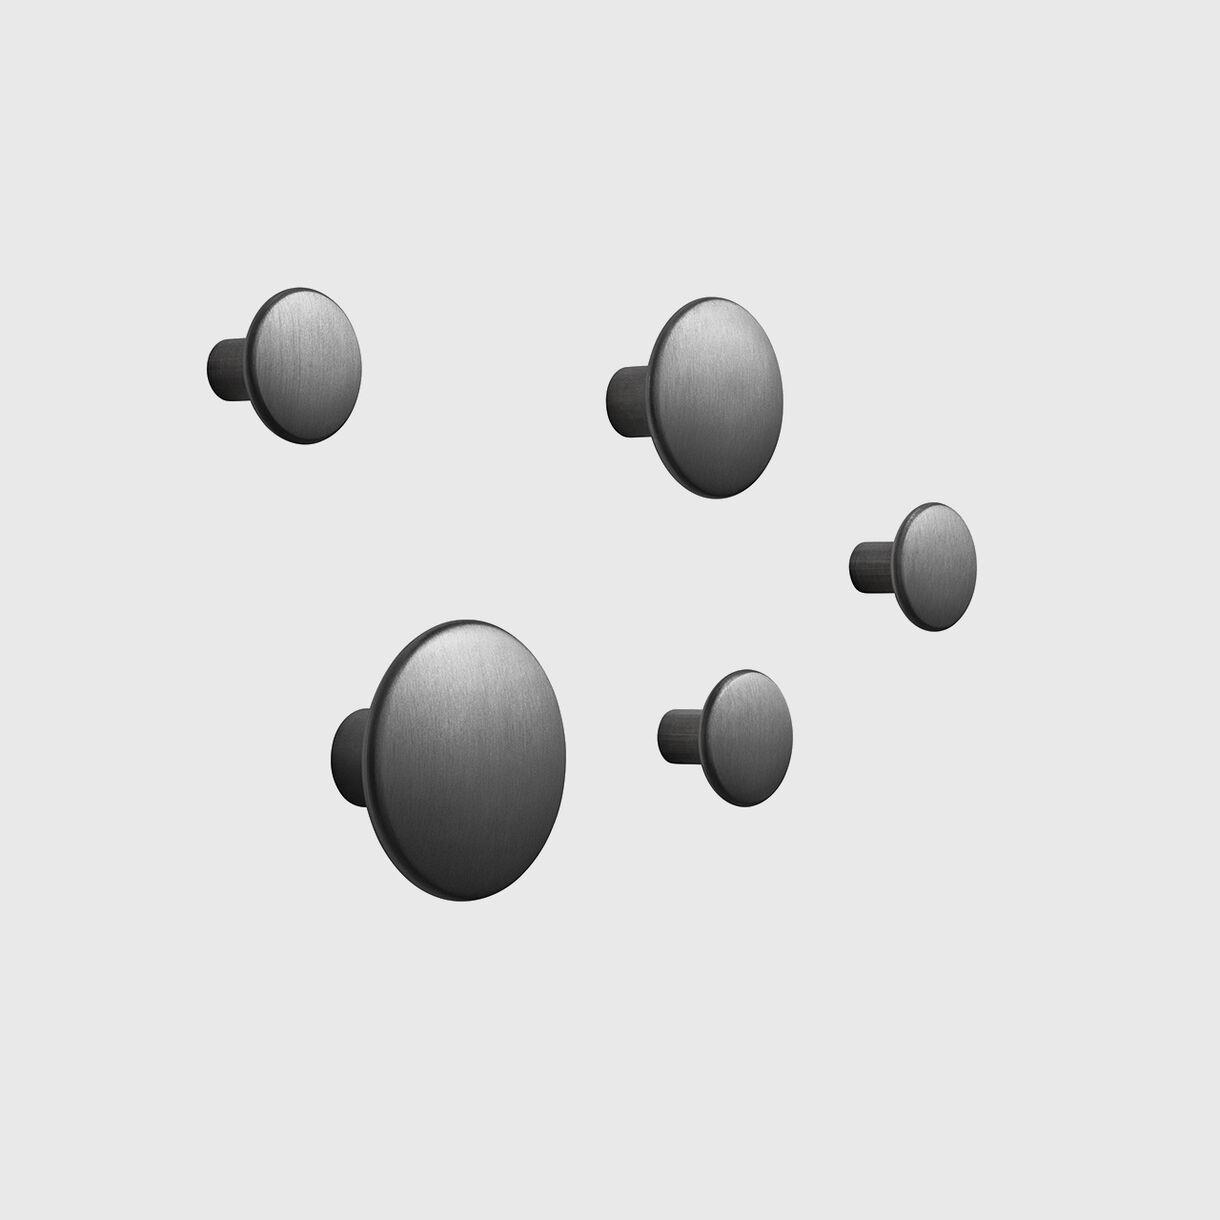 The Dots Metal, Black, Set of 5